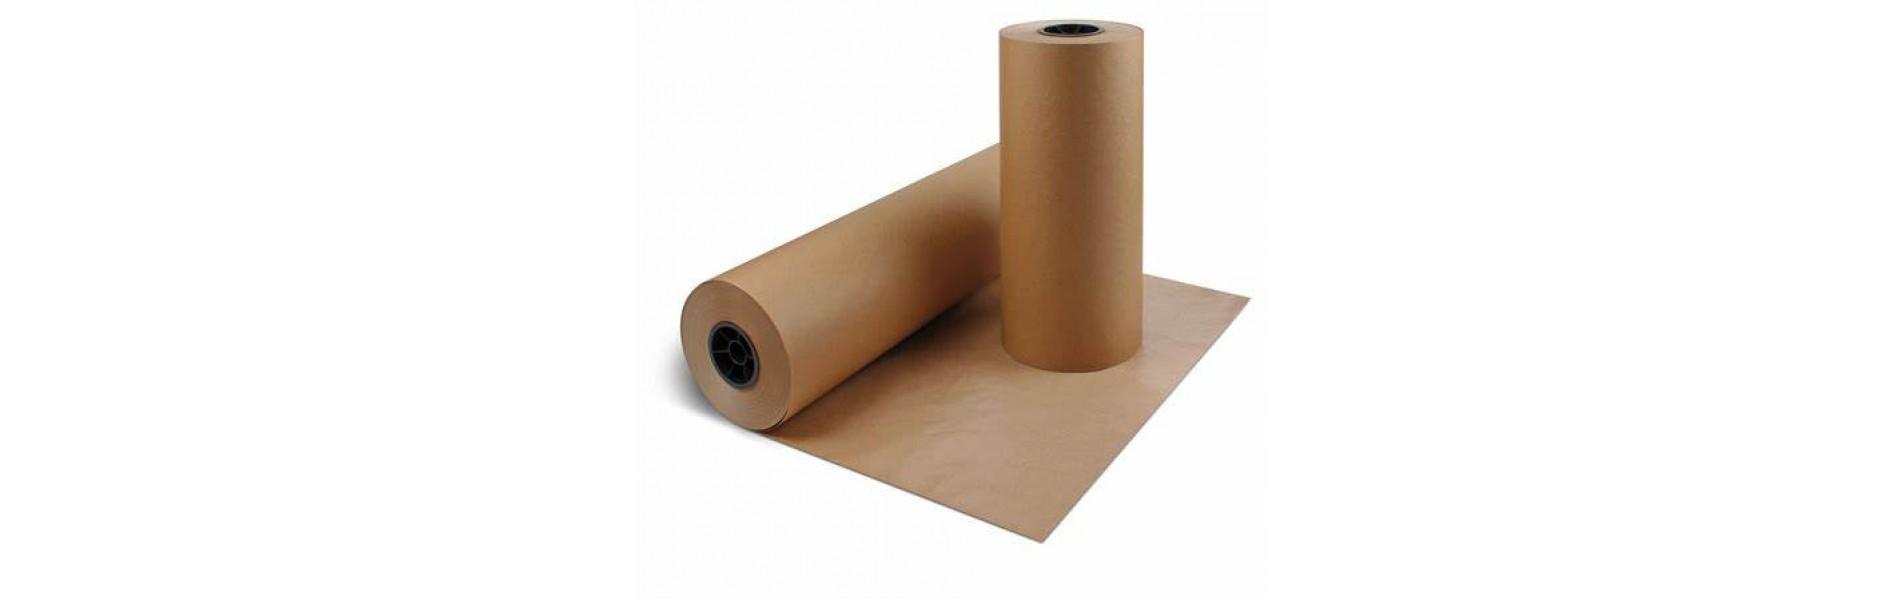 Butchers Paper & Paper Kraft Rolls